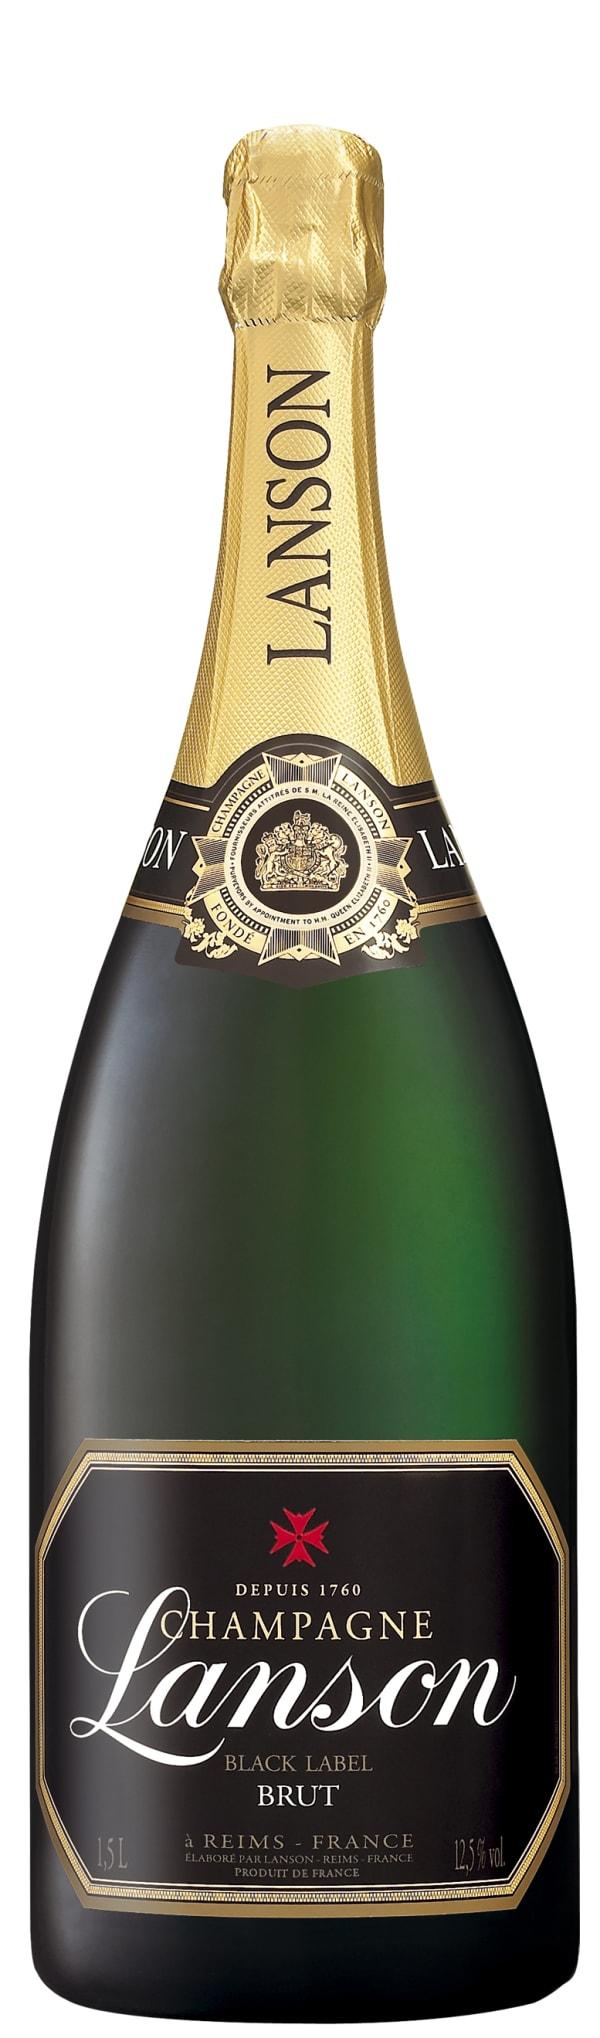 Lanson Black Label Magnum Champagne Brut